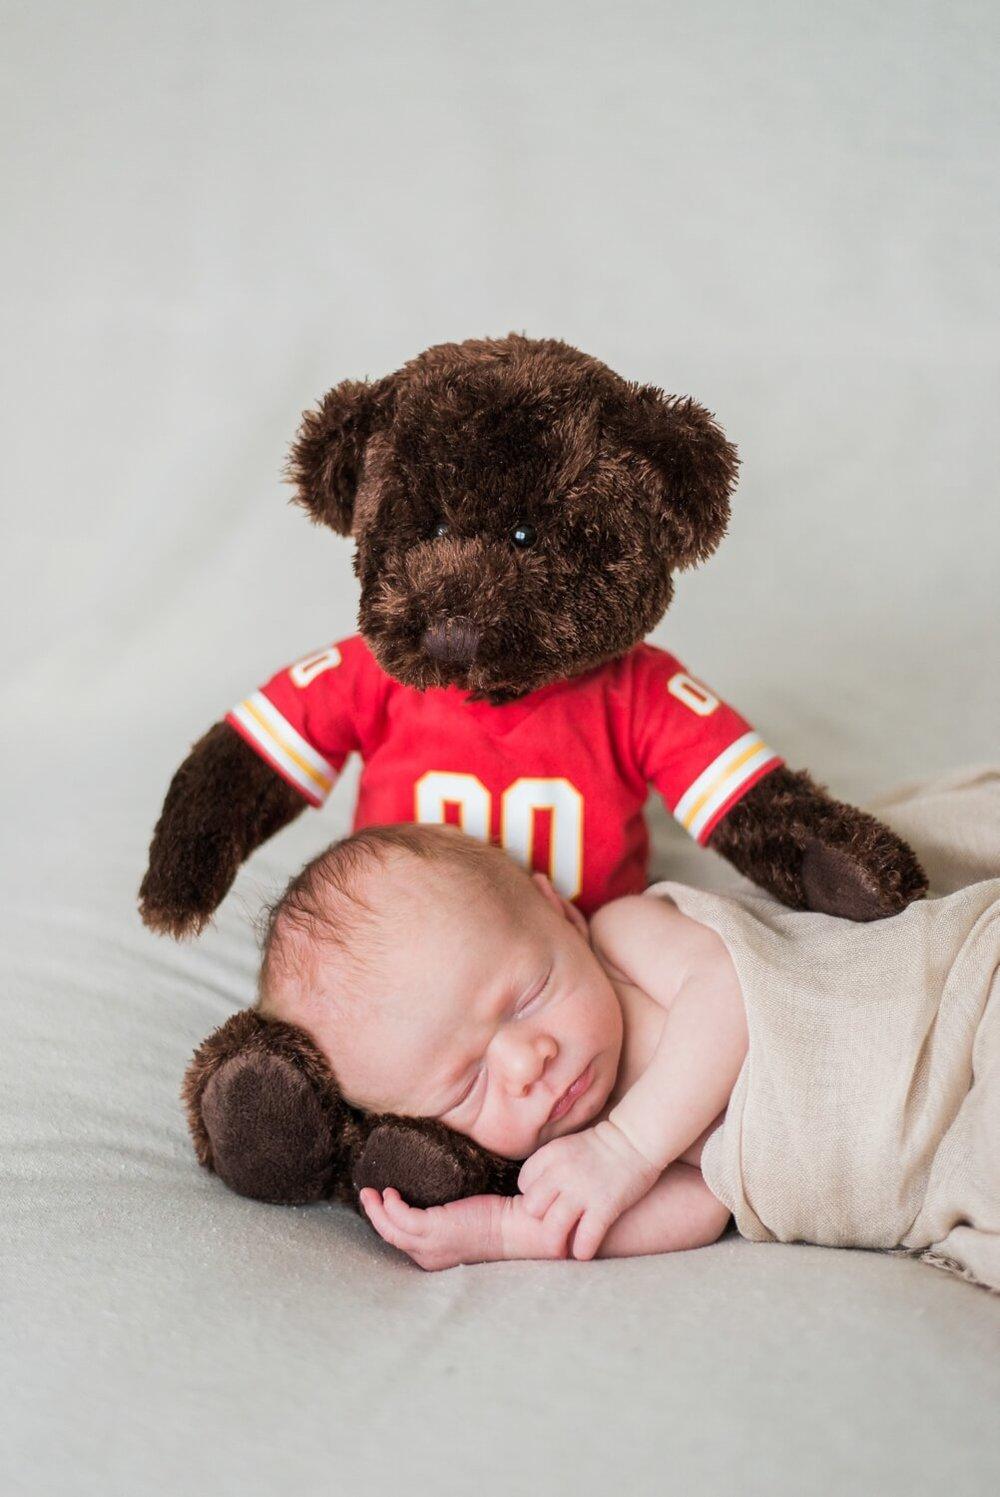 best-portland-oregon-newborn-photographer-sleeping-baby-boy-with-bear-shelley-marie-photography-43.jpg